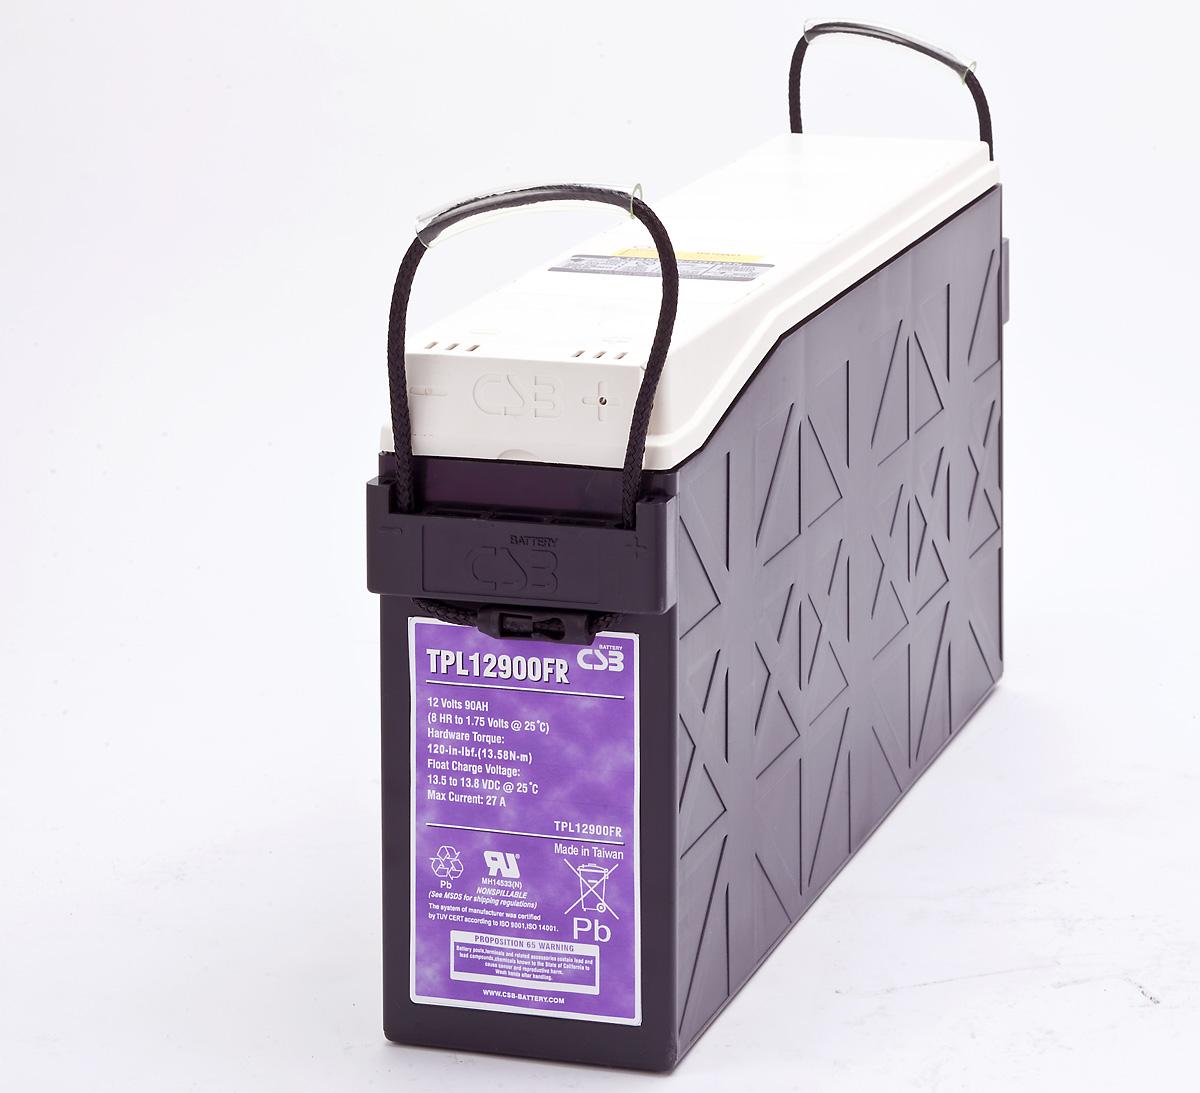 TPL12900